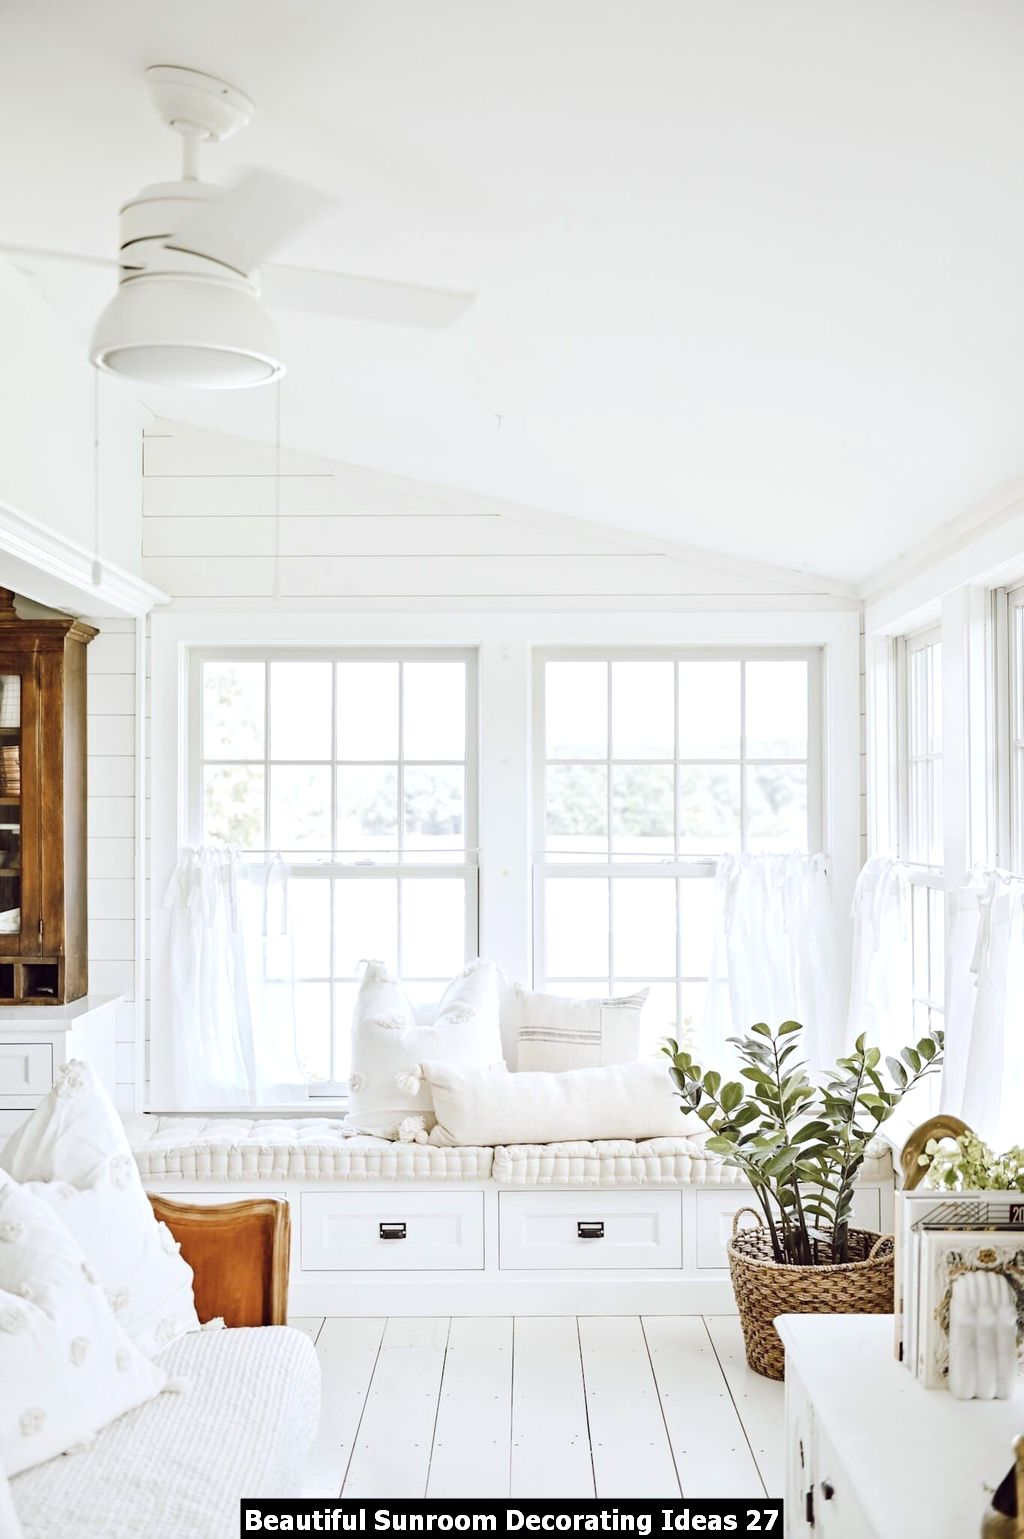 Beautiful Sunroom Decorating Ideas 27